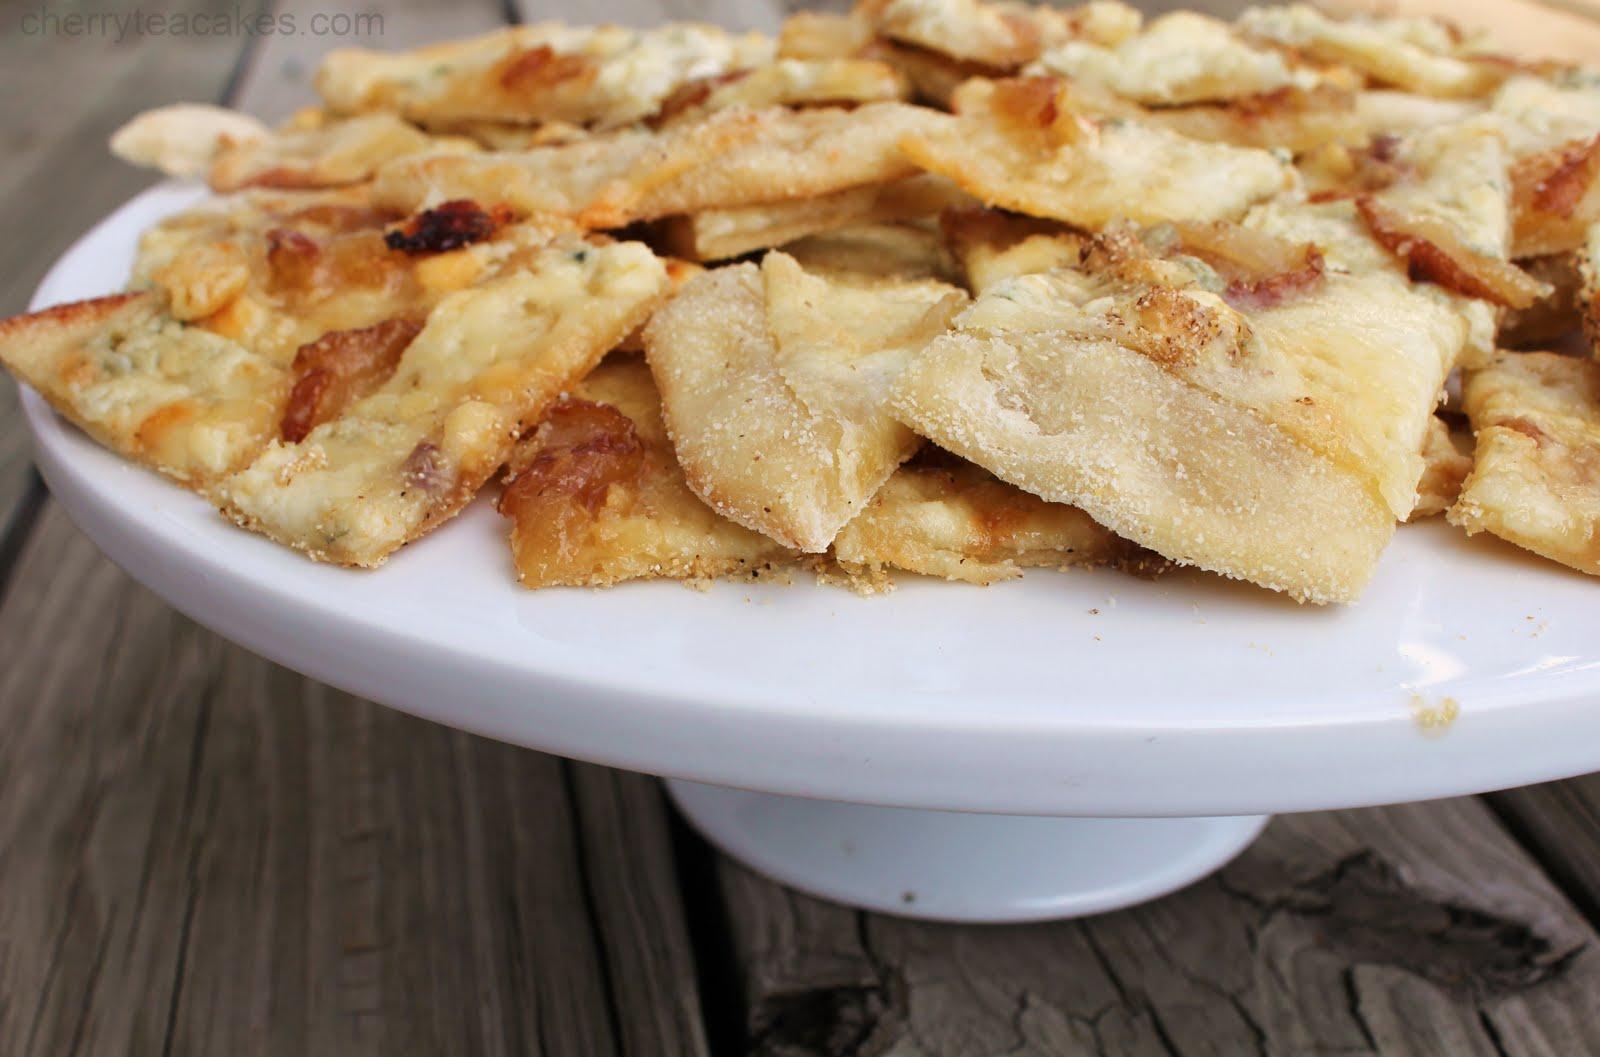 Cherry Tea Cakes: Caramelized Pear and Gorgonzola Pizza